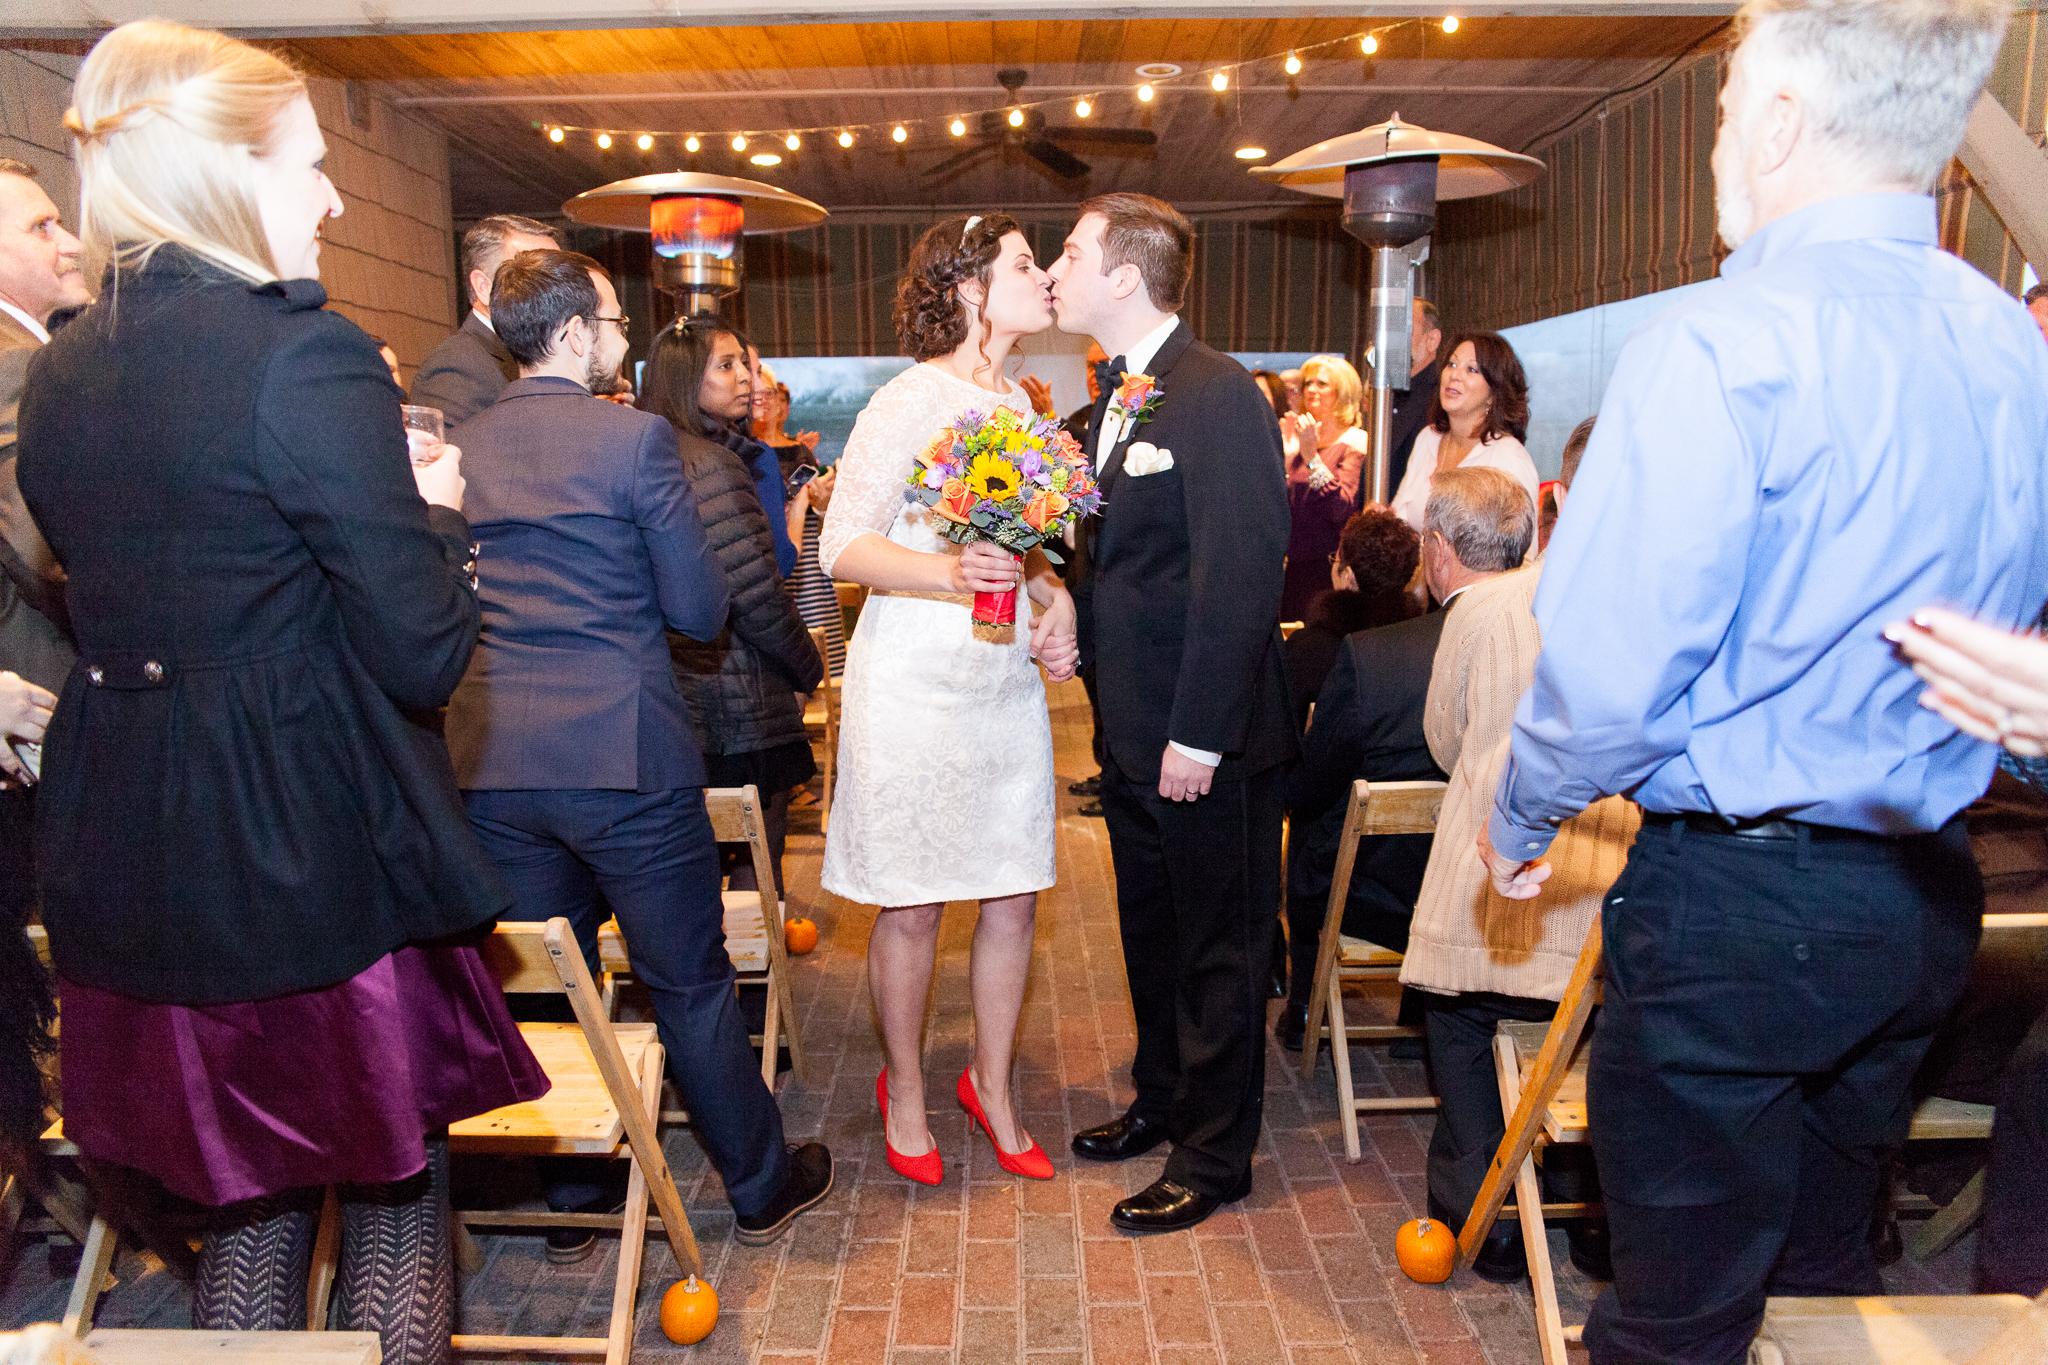 camuglia-whomstudio-chelsea_and_andy-nycphotographer-wedding-brooklyn-buffalo-timberlodge-092-0651.jpg